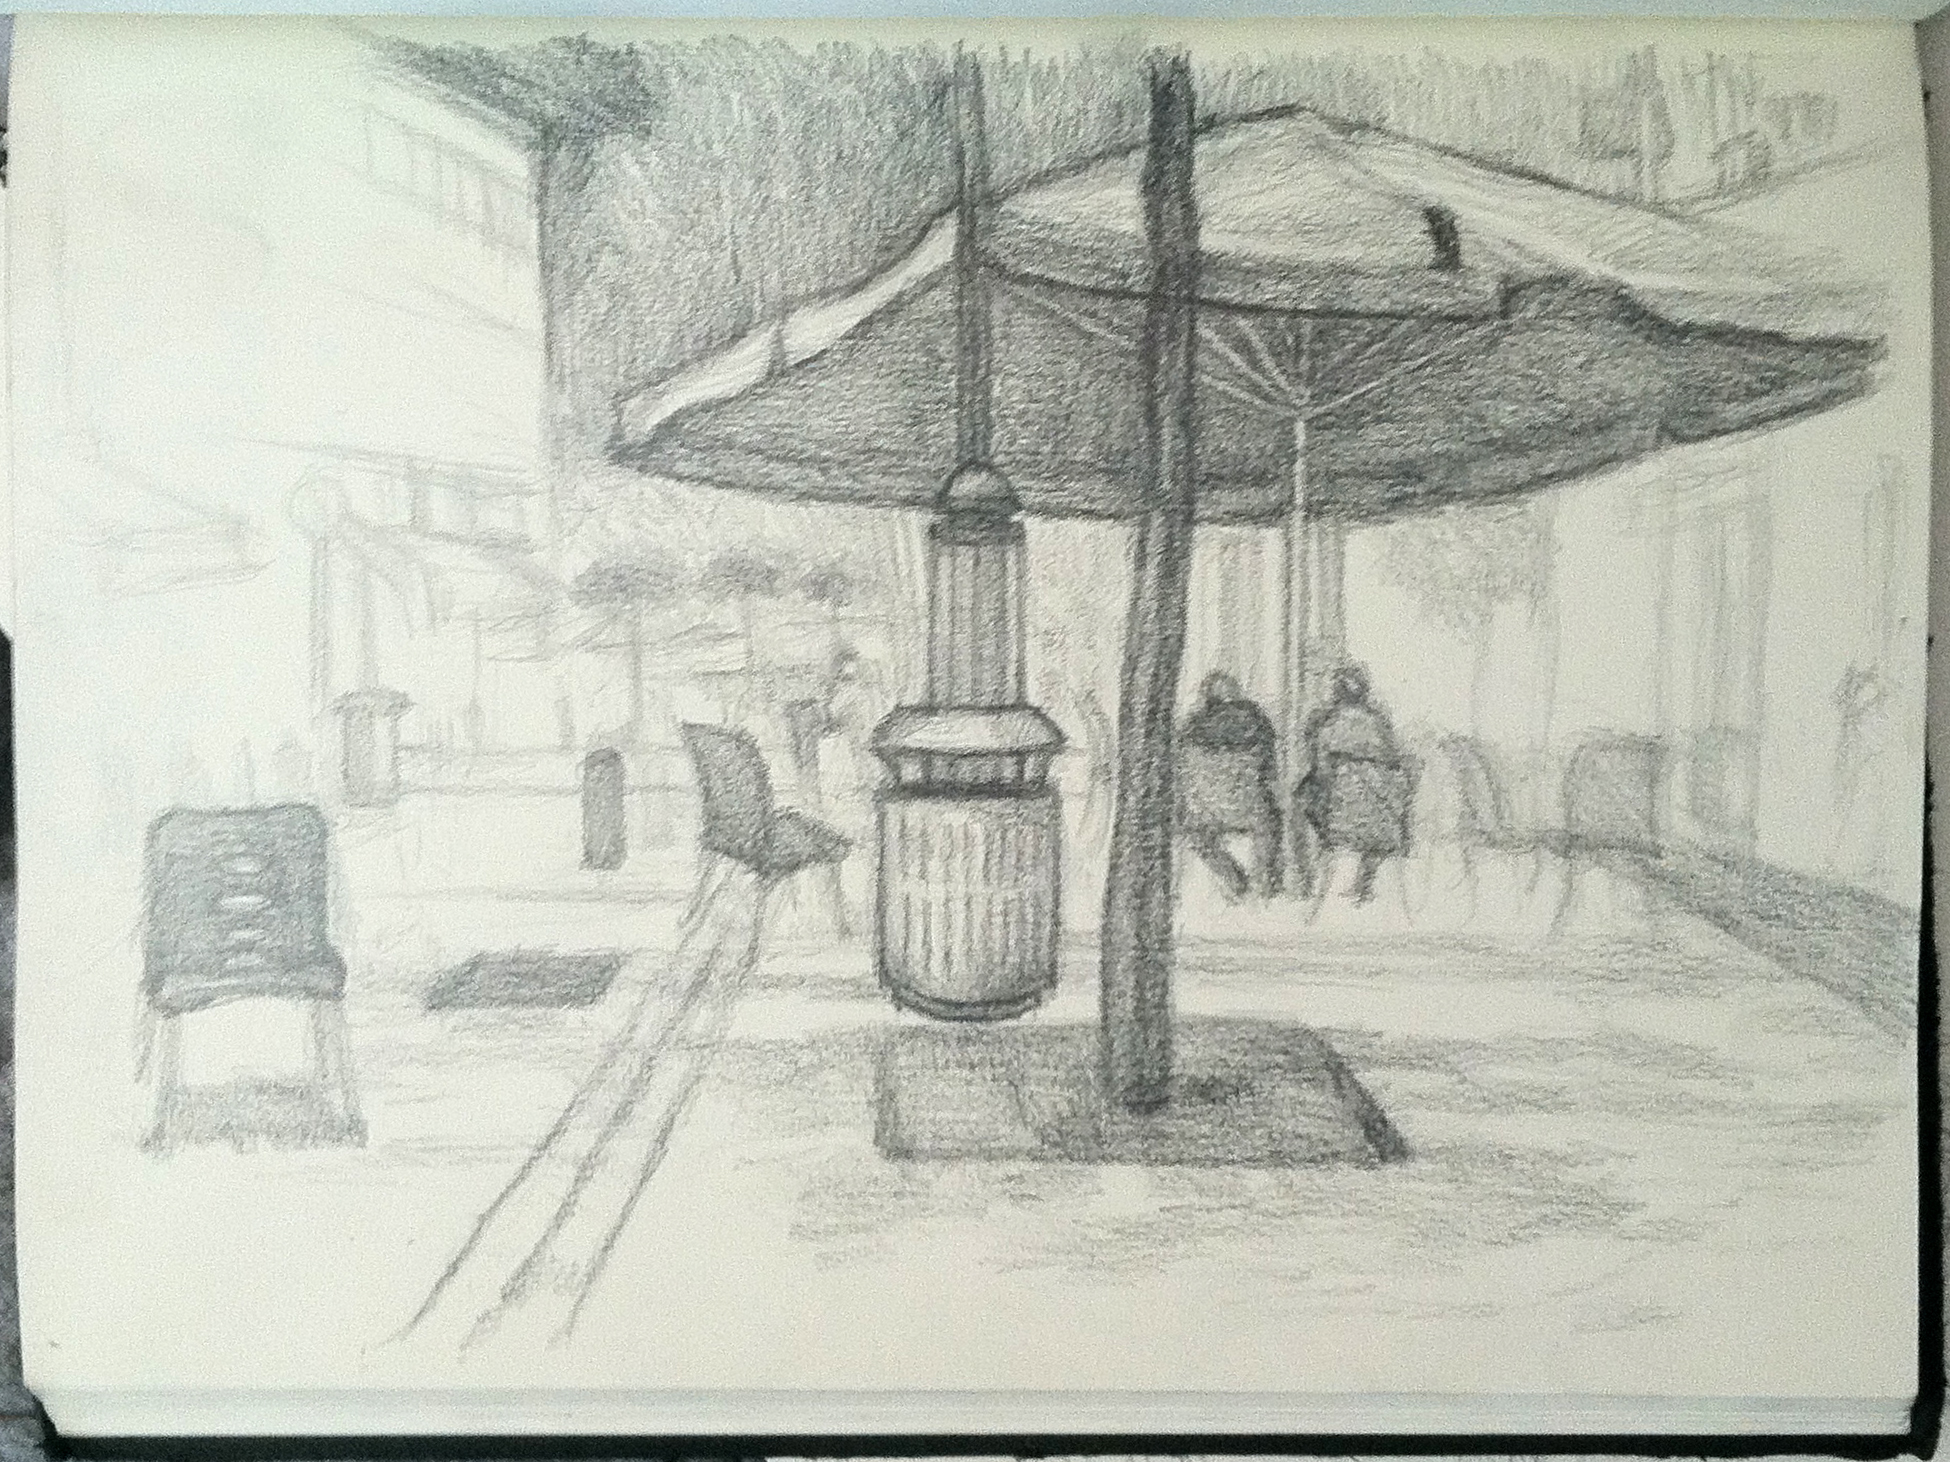 Line Drawing Jerusalem : Observational drawing evening in downtown jerusalem u yona s yurt